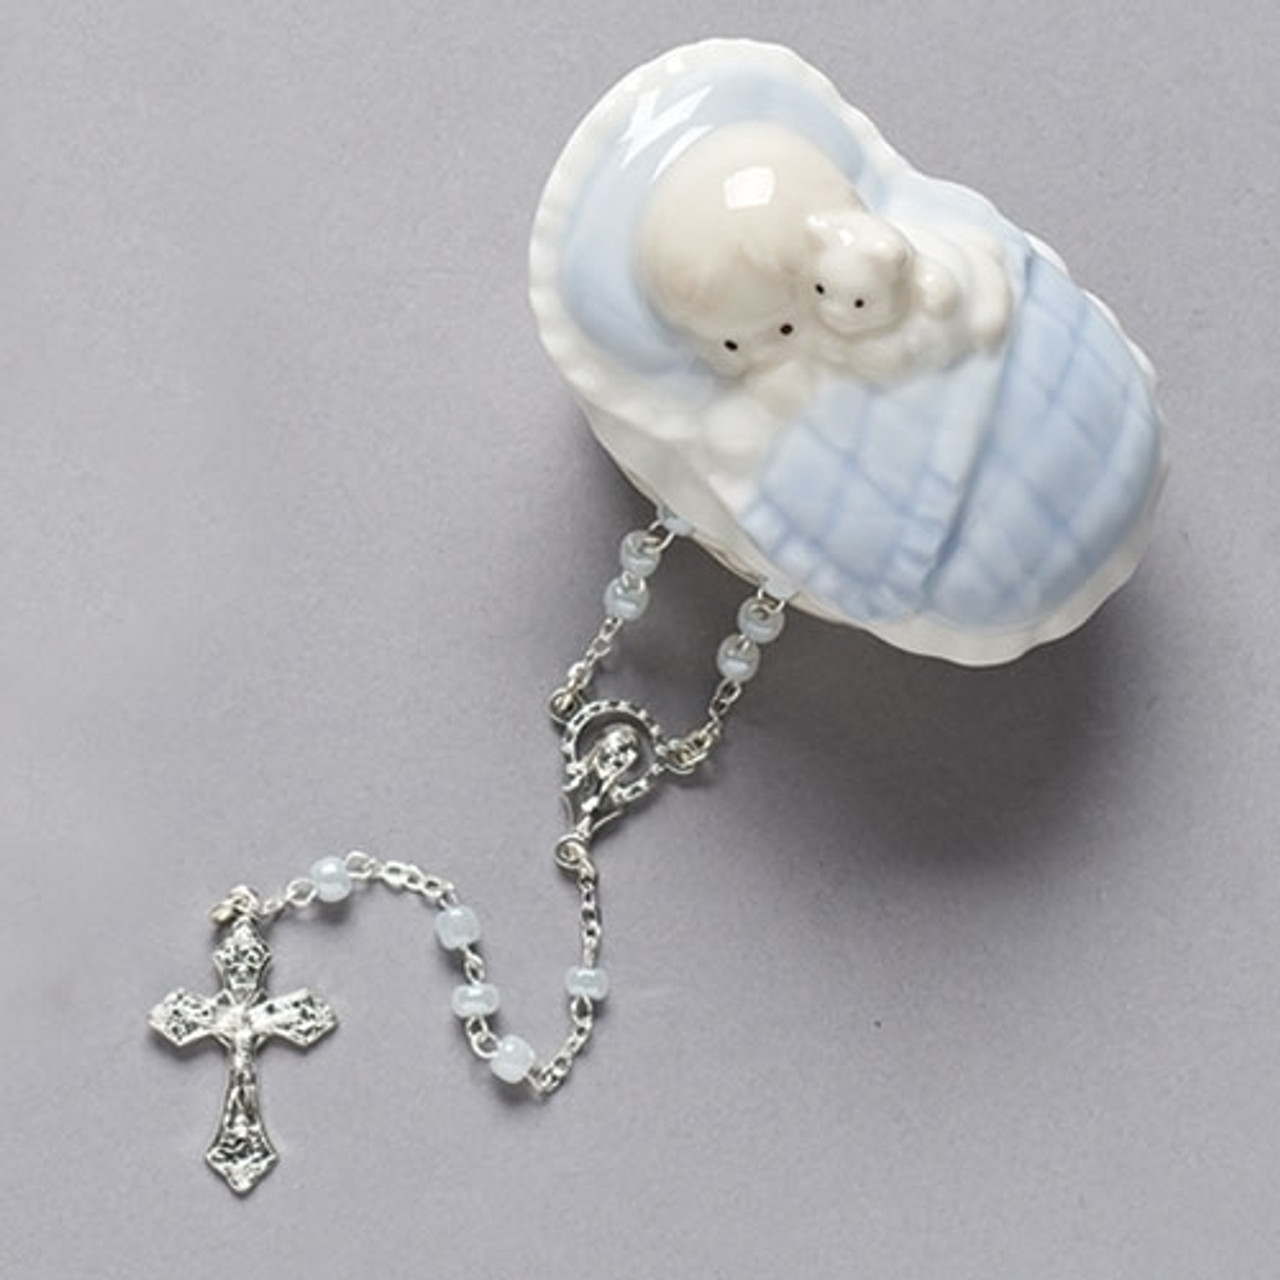 Keepsake Box   Boy Tucked Under Blanket   Porcelain   Rosary Beads Included    31008